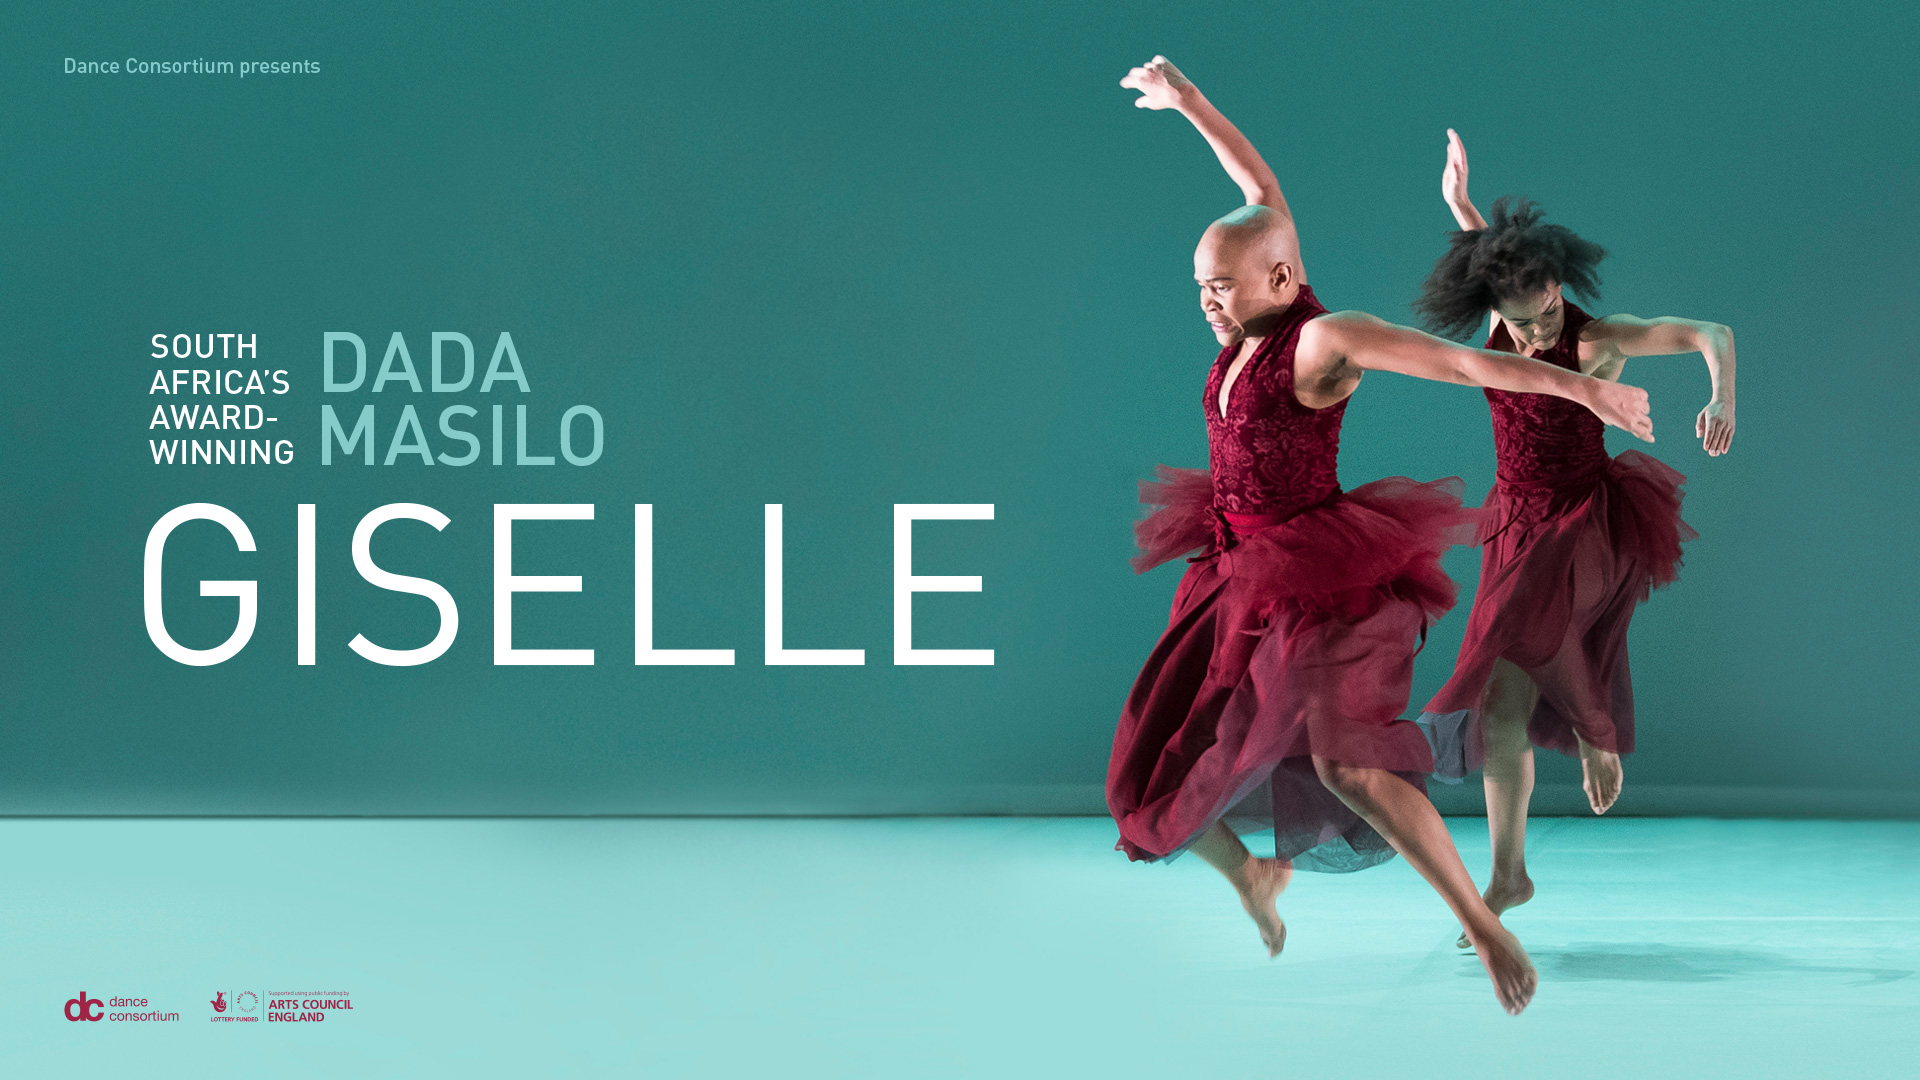 Dada Masilo's Giselle